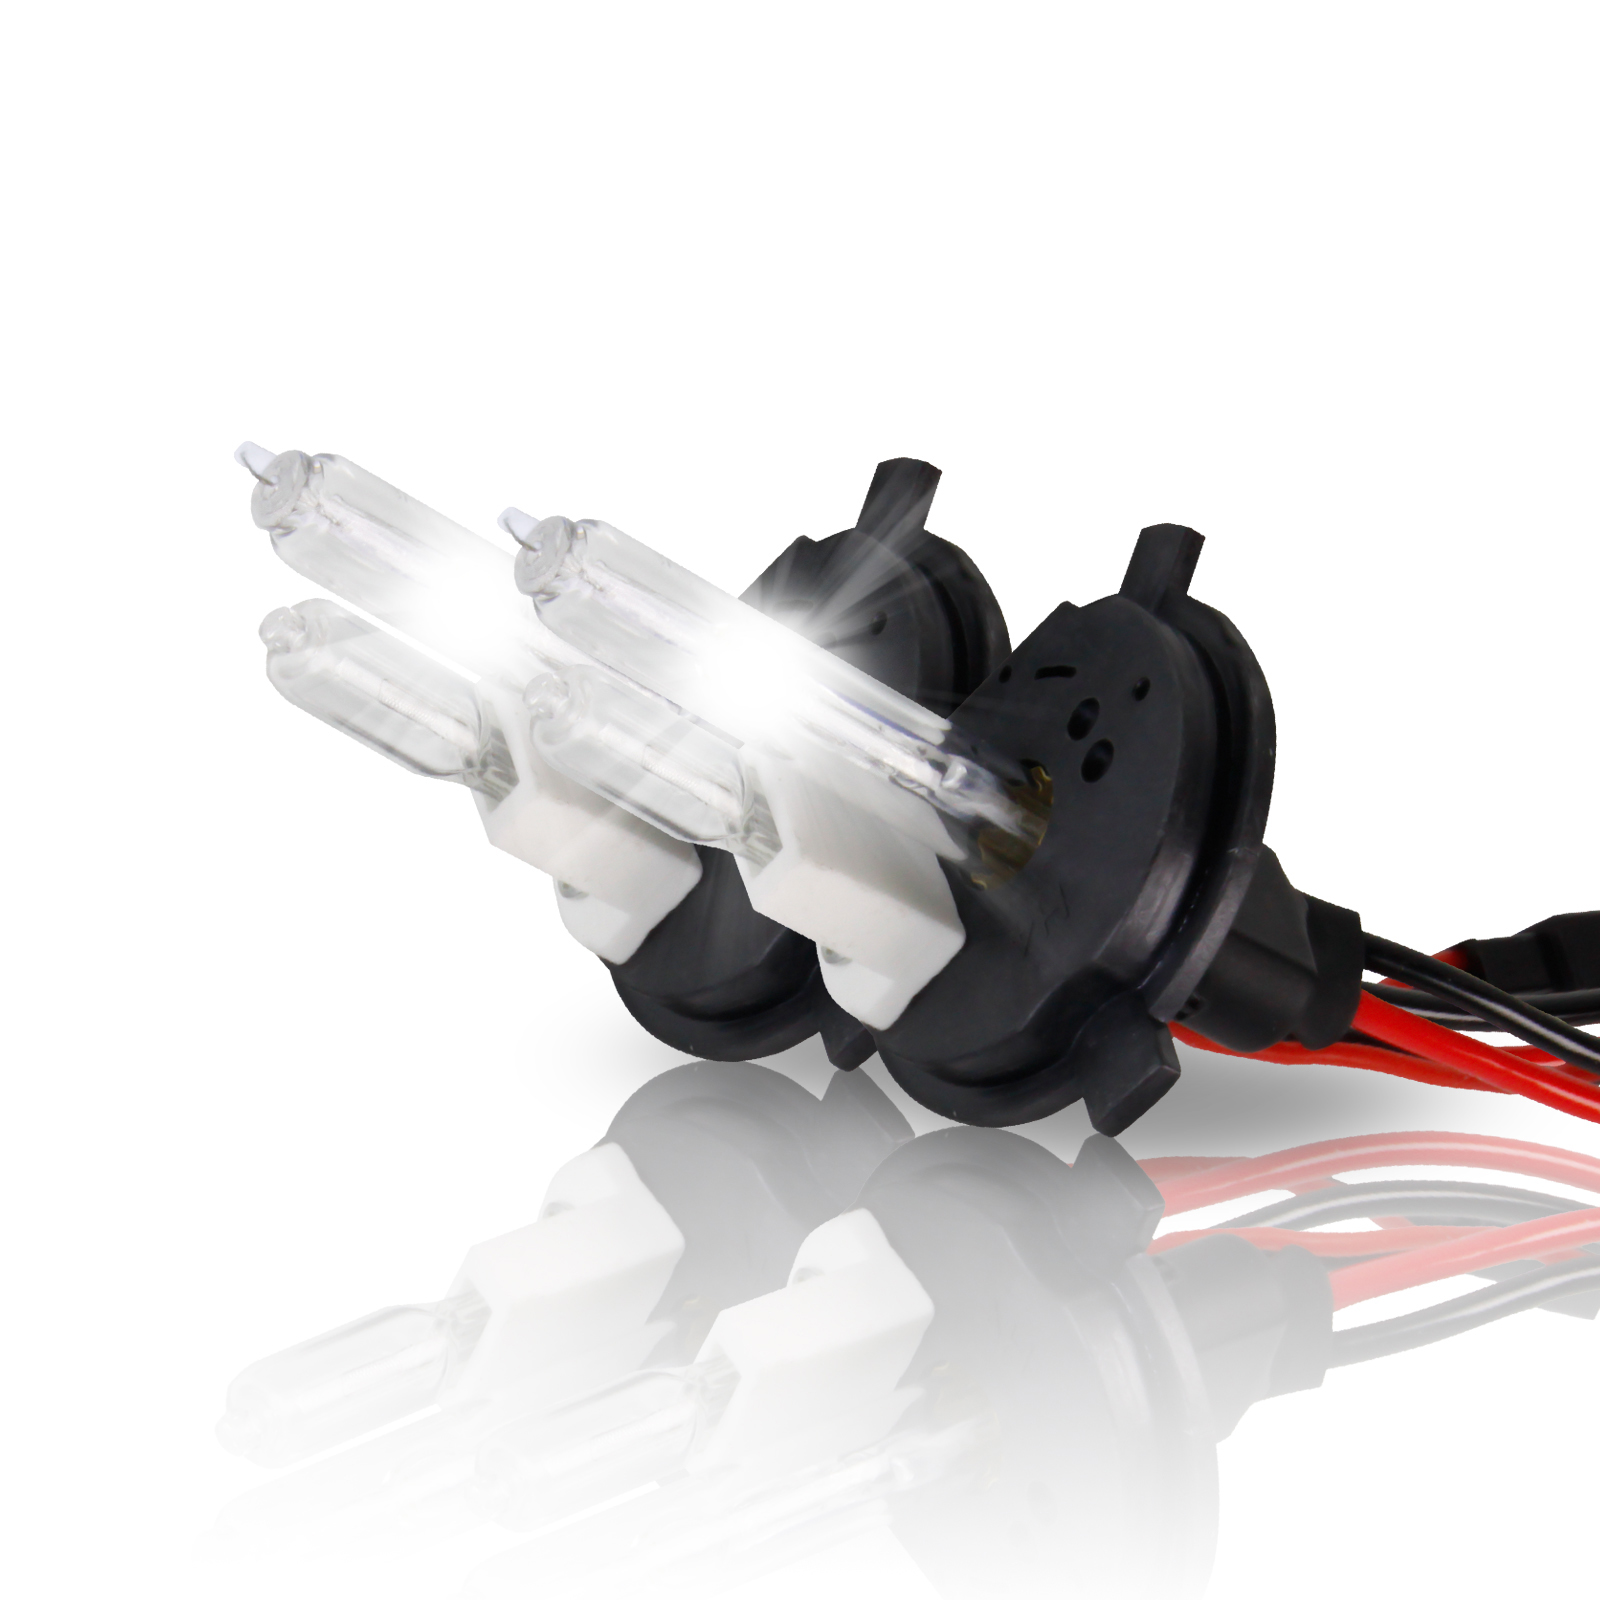 Project RA 35W H4 Purple Xenon HID Headlight Bulbs - 9003 Hi / Low HID Replacement Bulbs - Pair